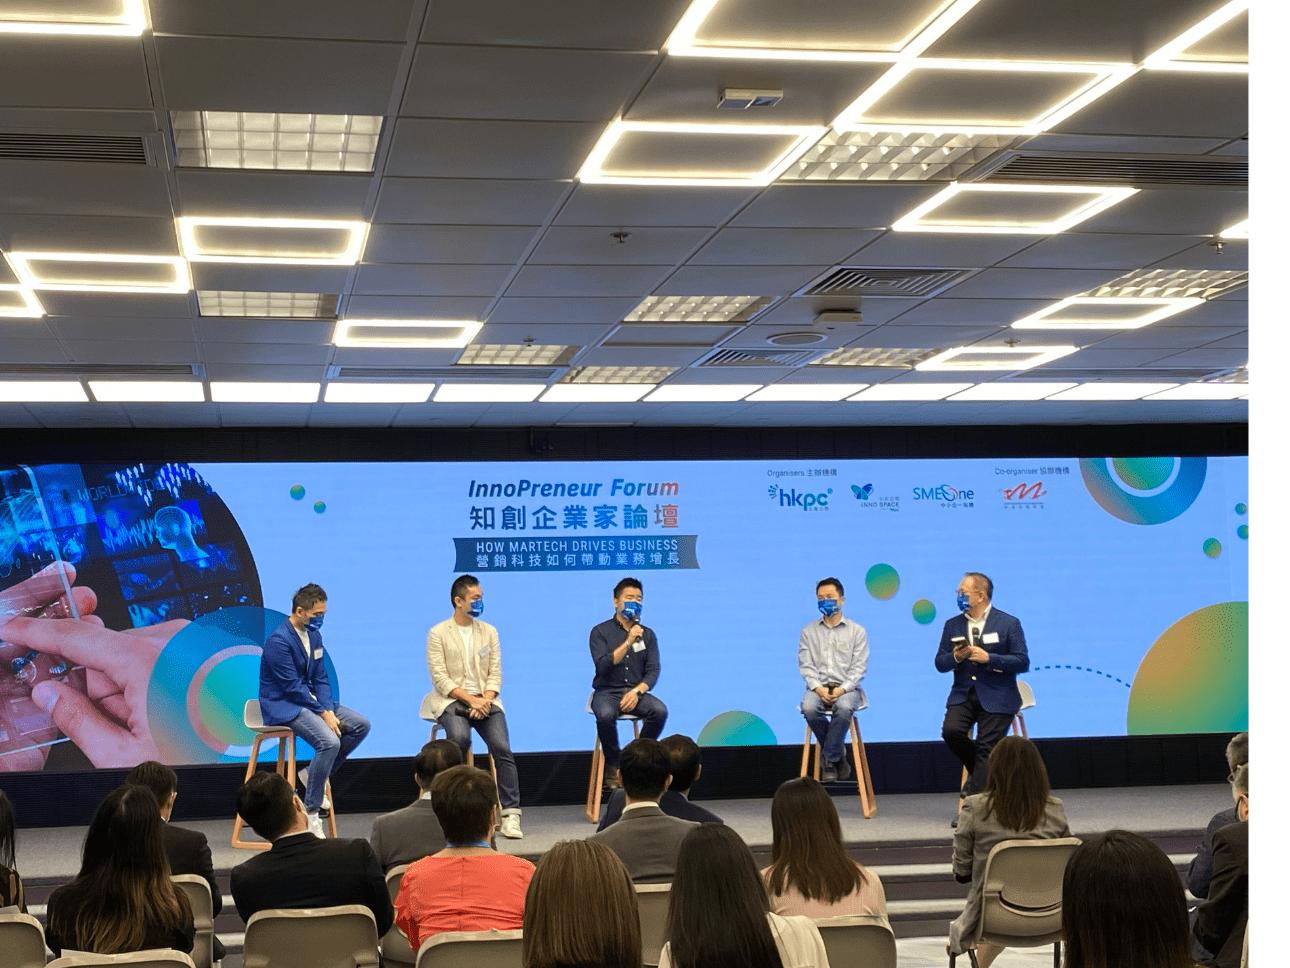 Afternoon symposium participation at HKPC x HKIM InnoPreneur Forum 2021